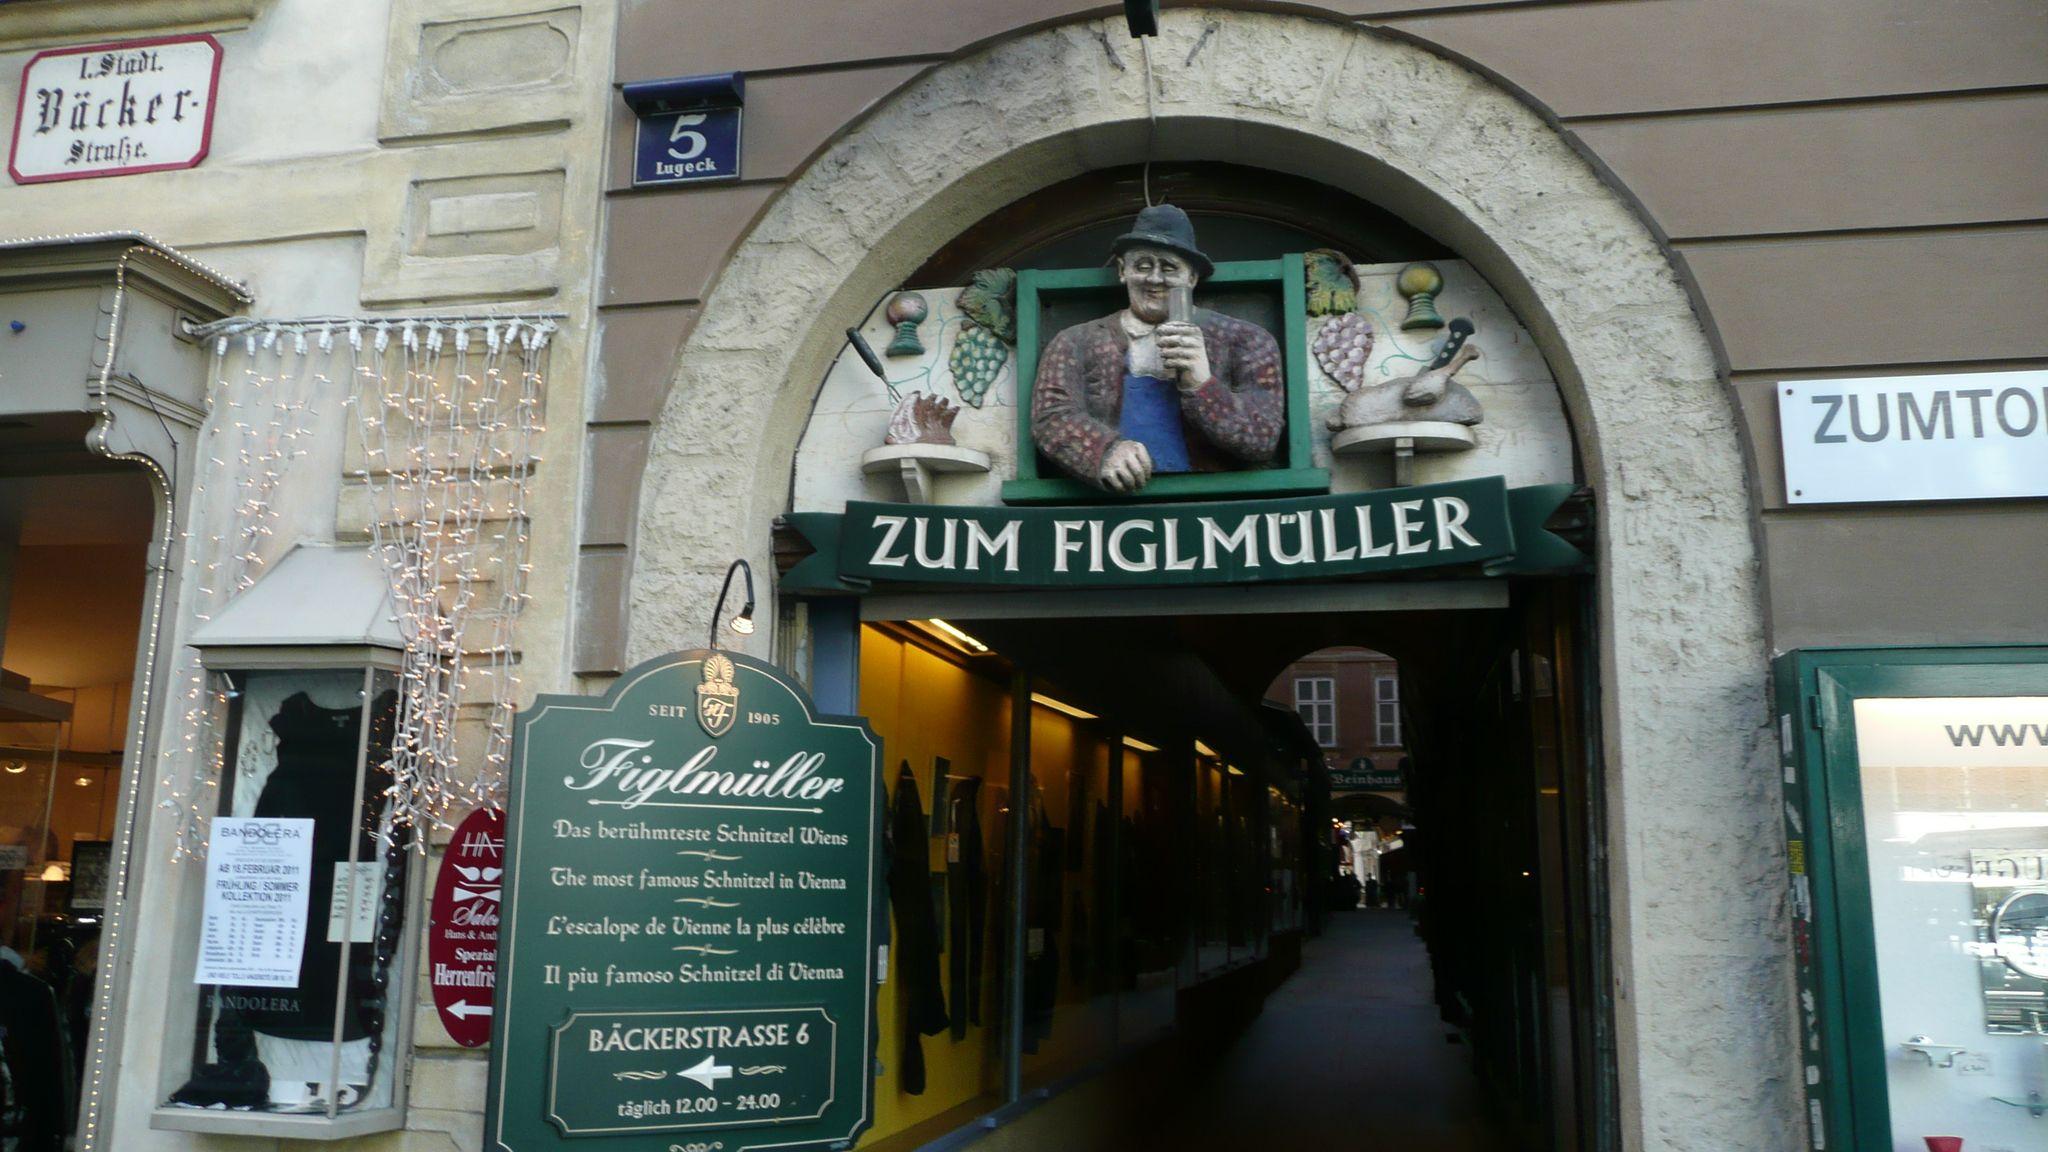 Figlmuller(Wollzeile 5), Βιέννη. Αυστρία, Ευρώπη